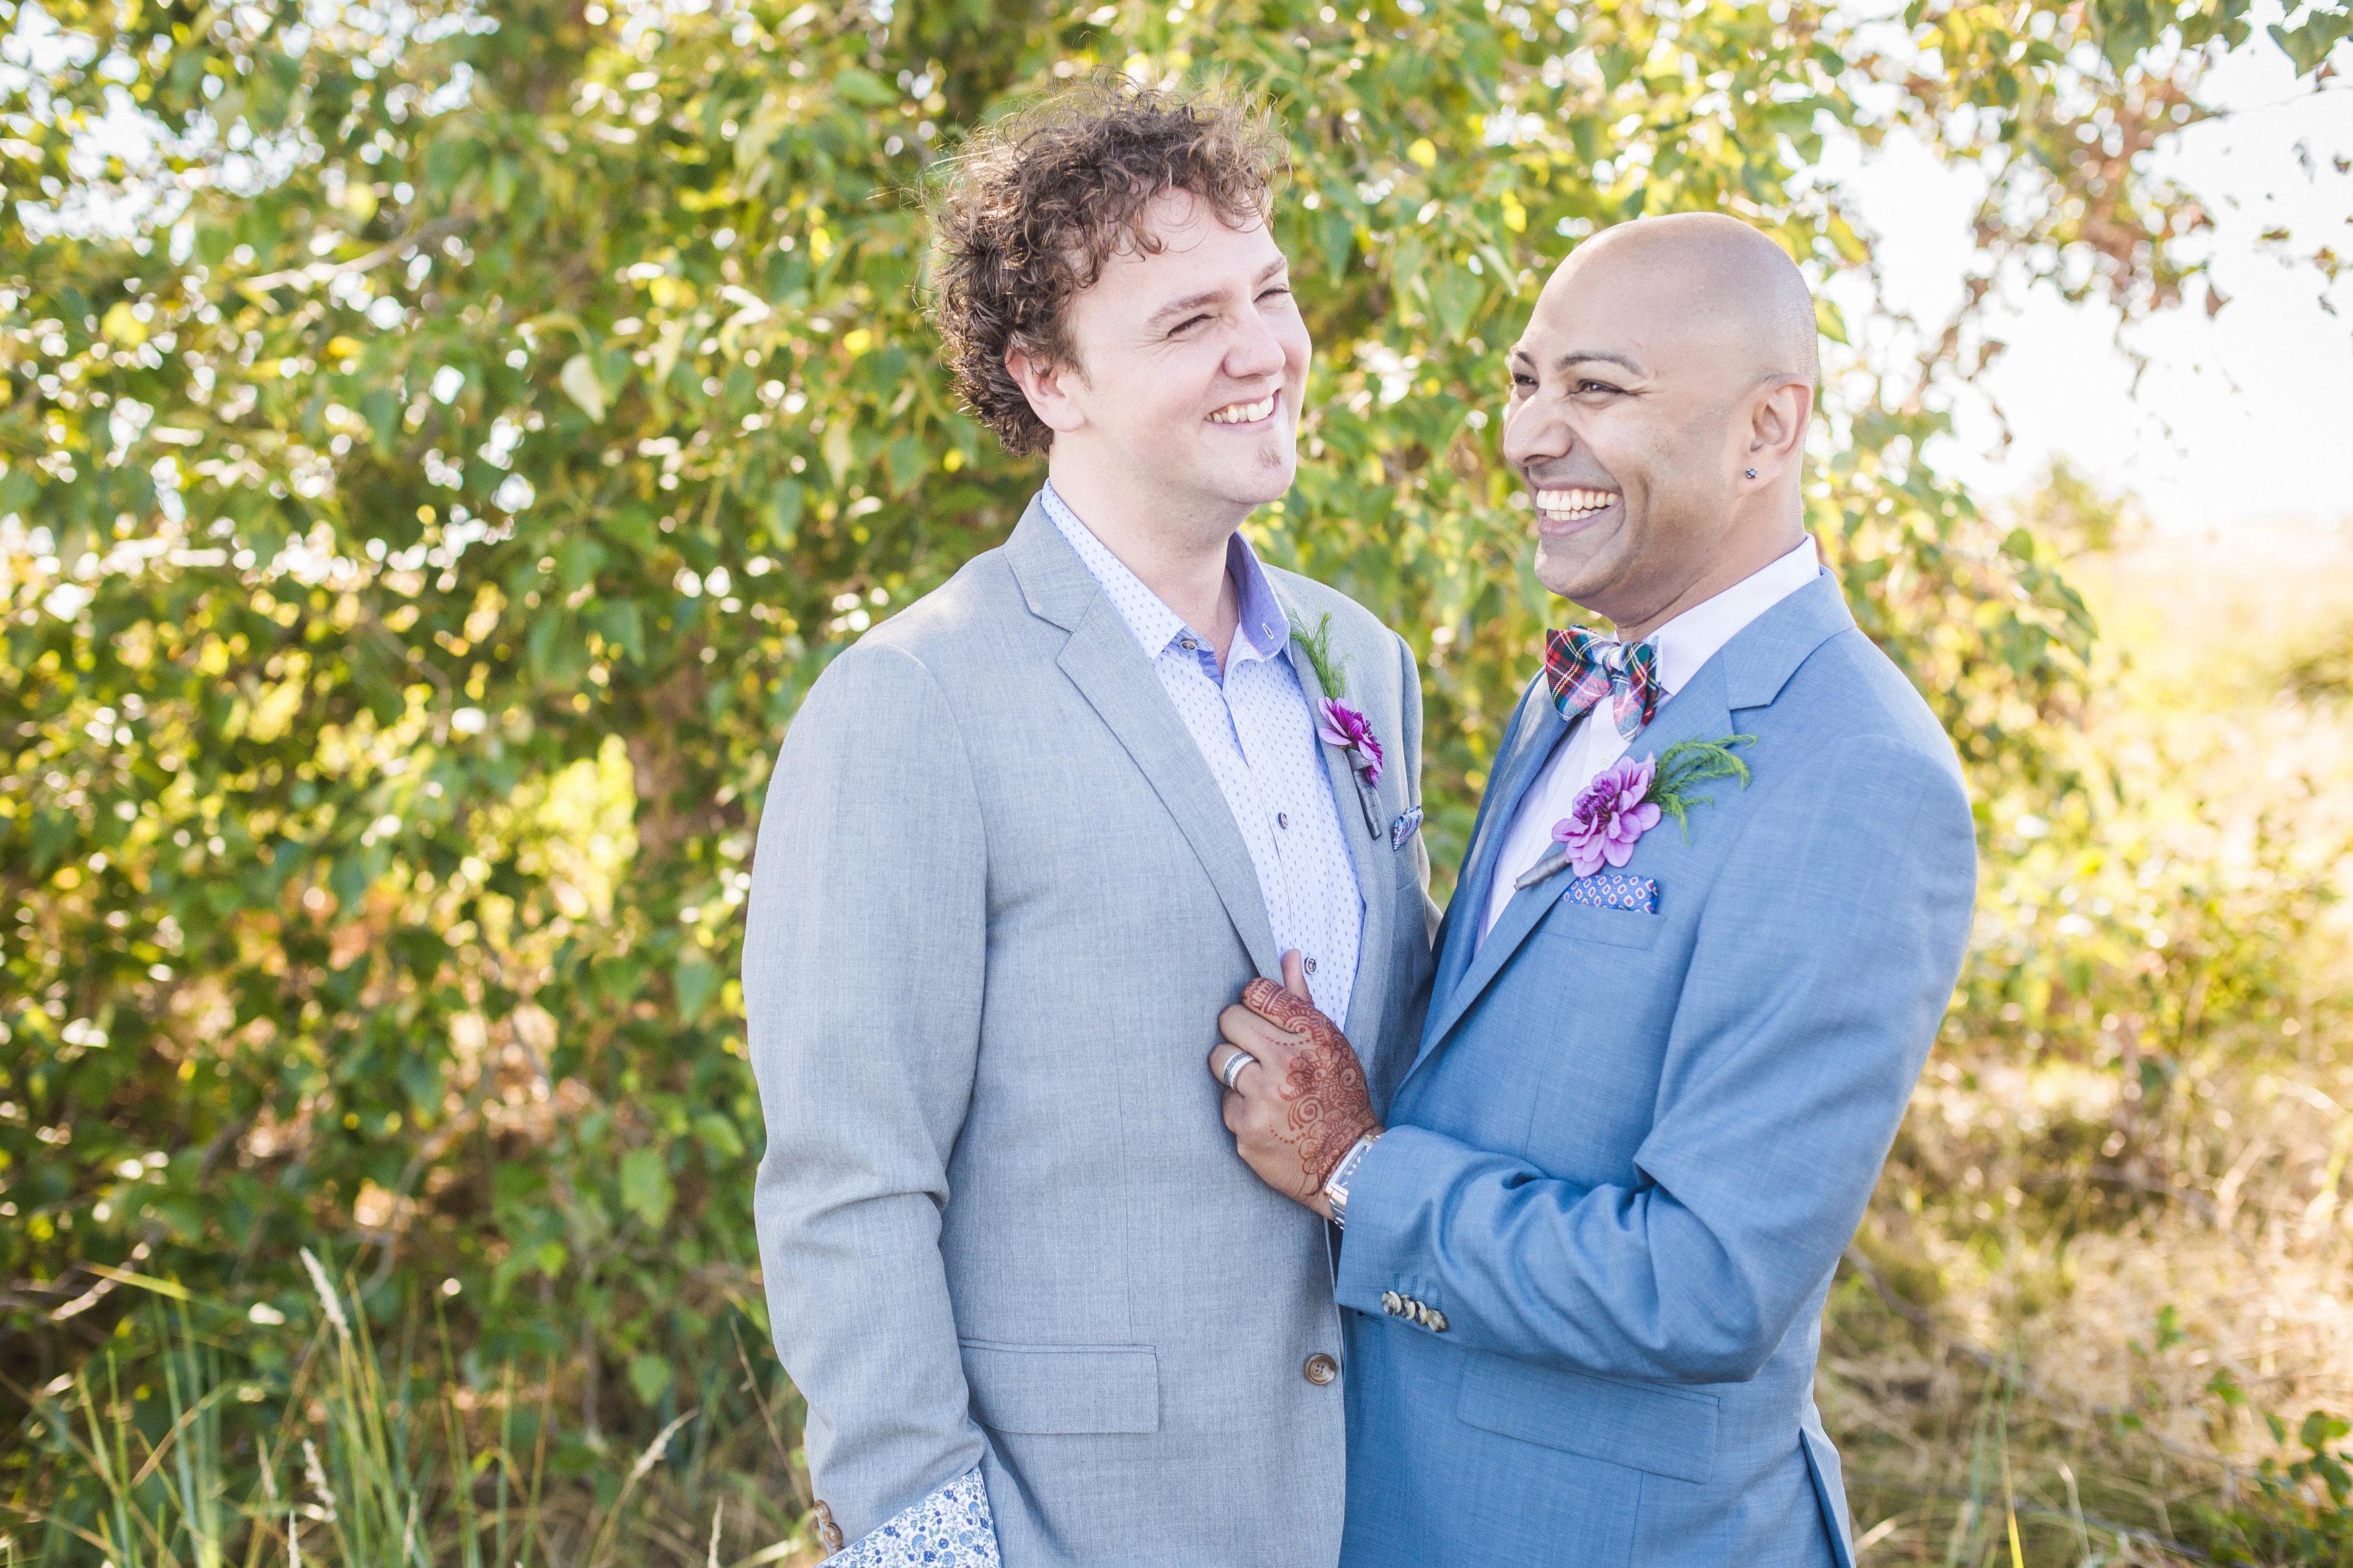 IONA BEACH VANCOUVER GAY WEDDING – MARKO & JOSH